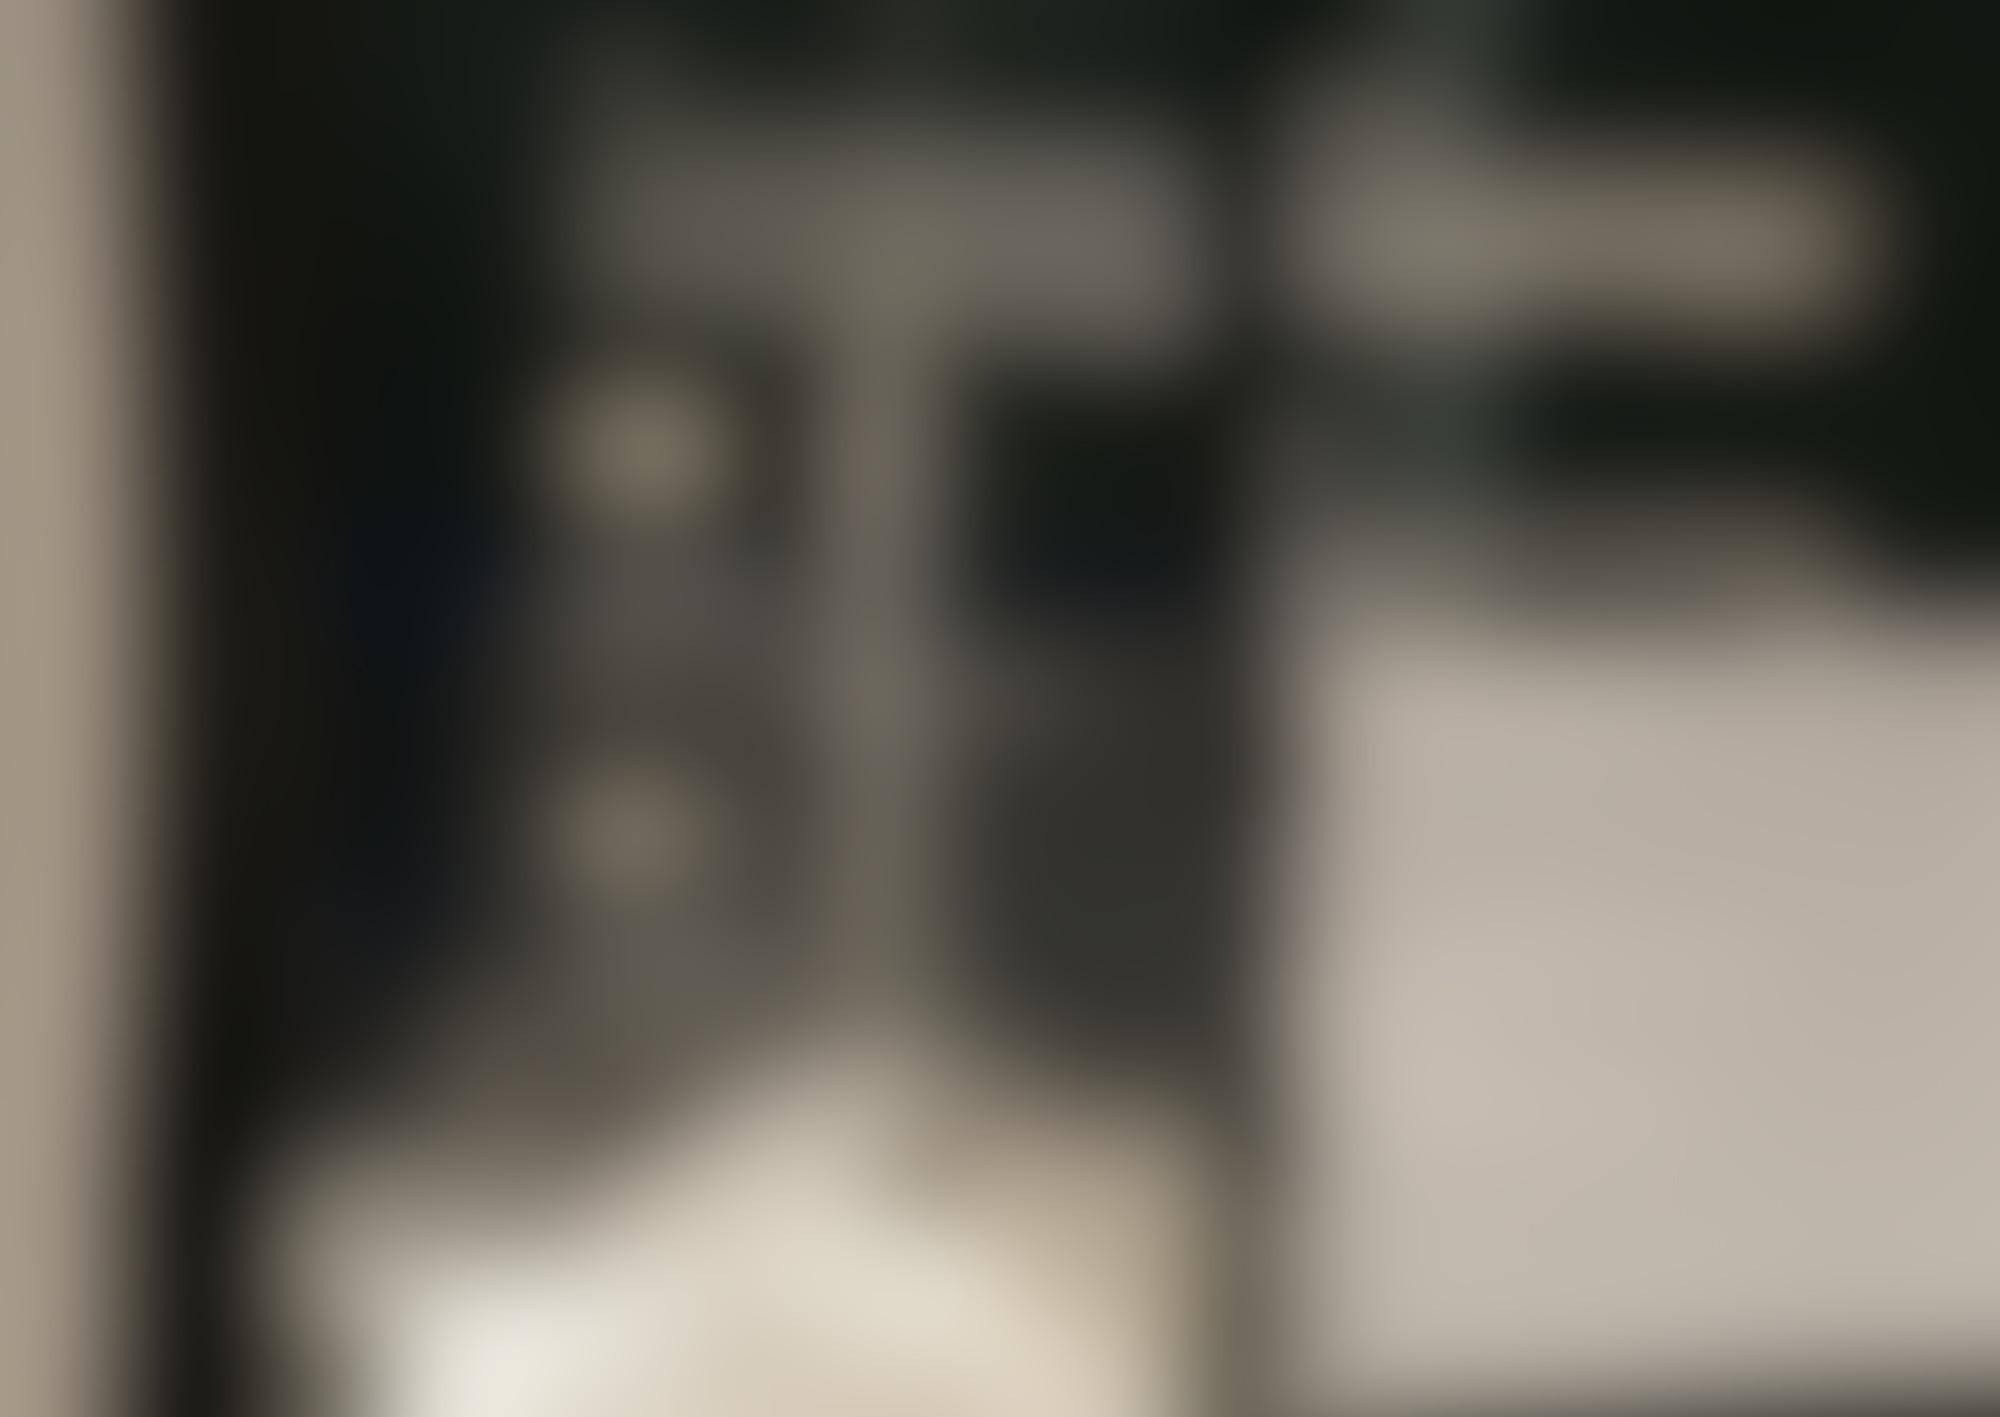 Fridaicons autocompressfitresizeixlibphp 1 1 0max h2000max w3 D2000q80s18afcf369dff75044c656c8e1b740b4e